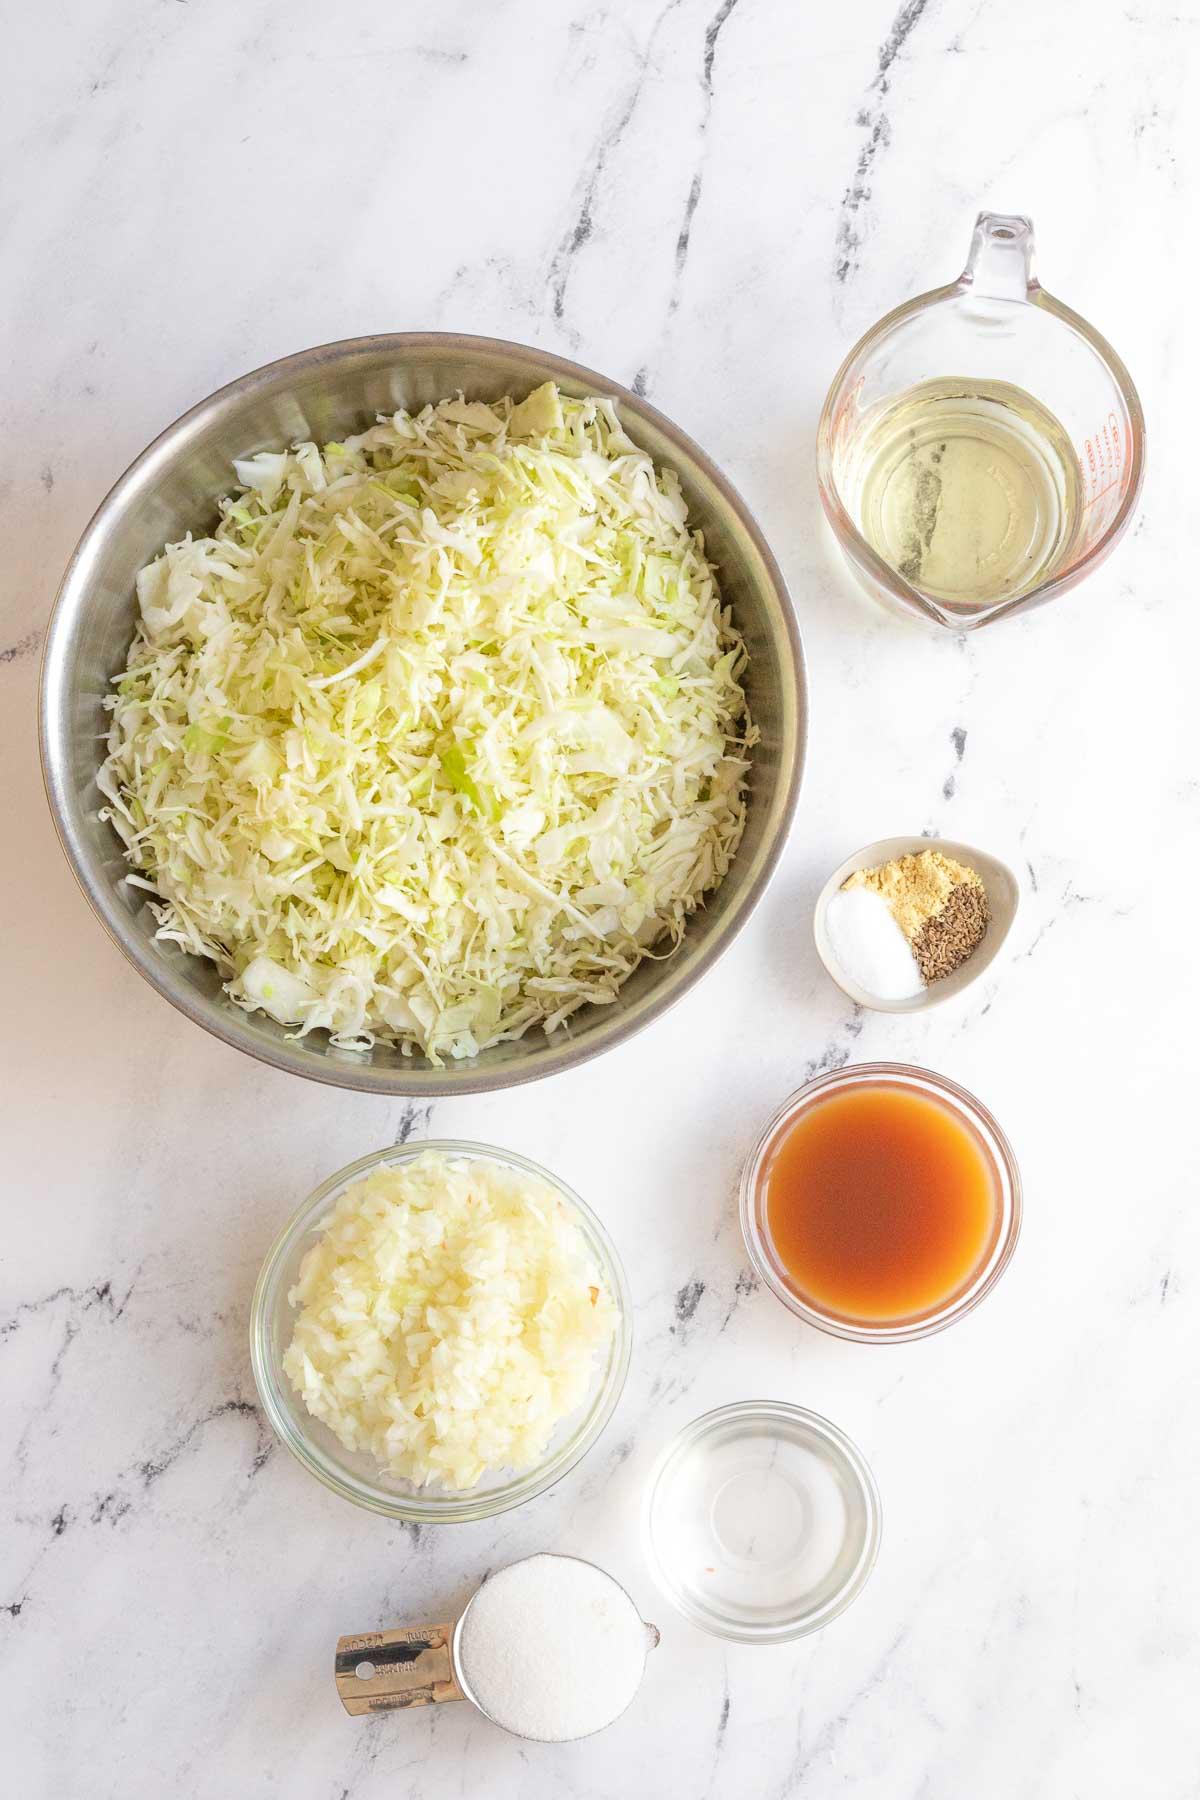 Ingredients for Amish Vinegar Slaw in prep bowls